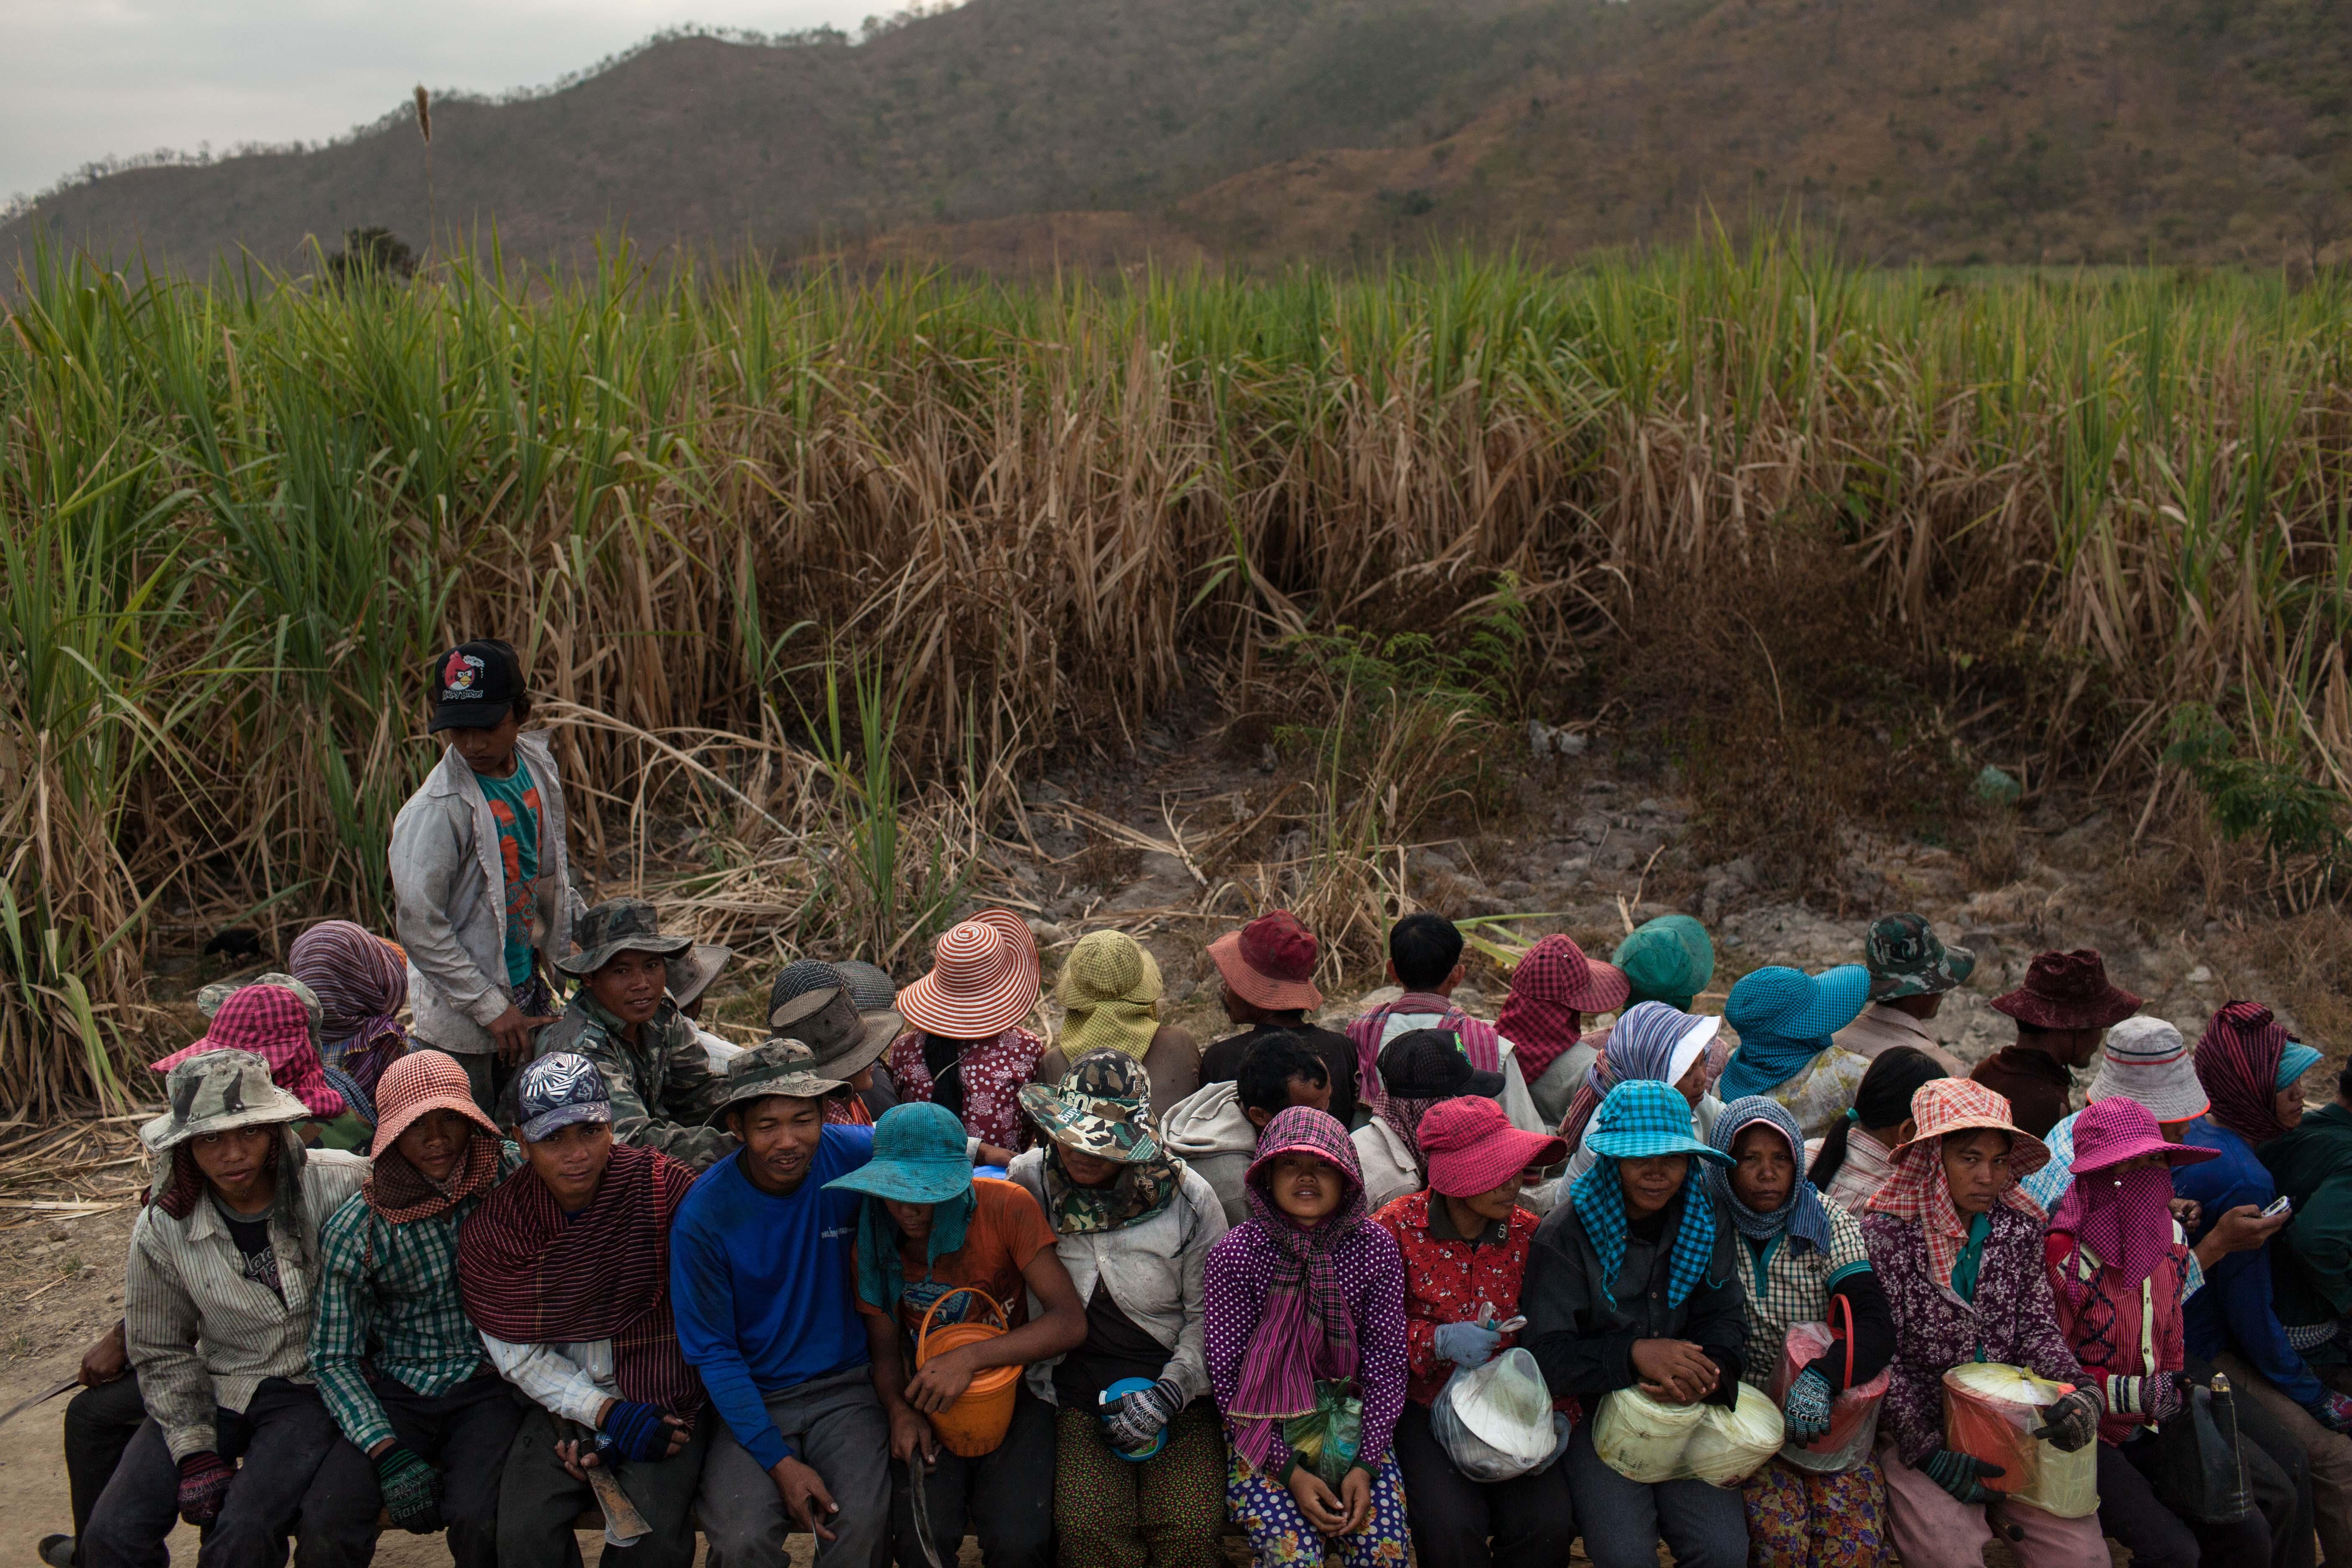 Photo by Nicolas Axelrod & Thomas Cristofoletti through Equitable Cambodia